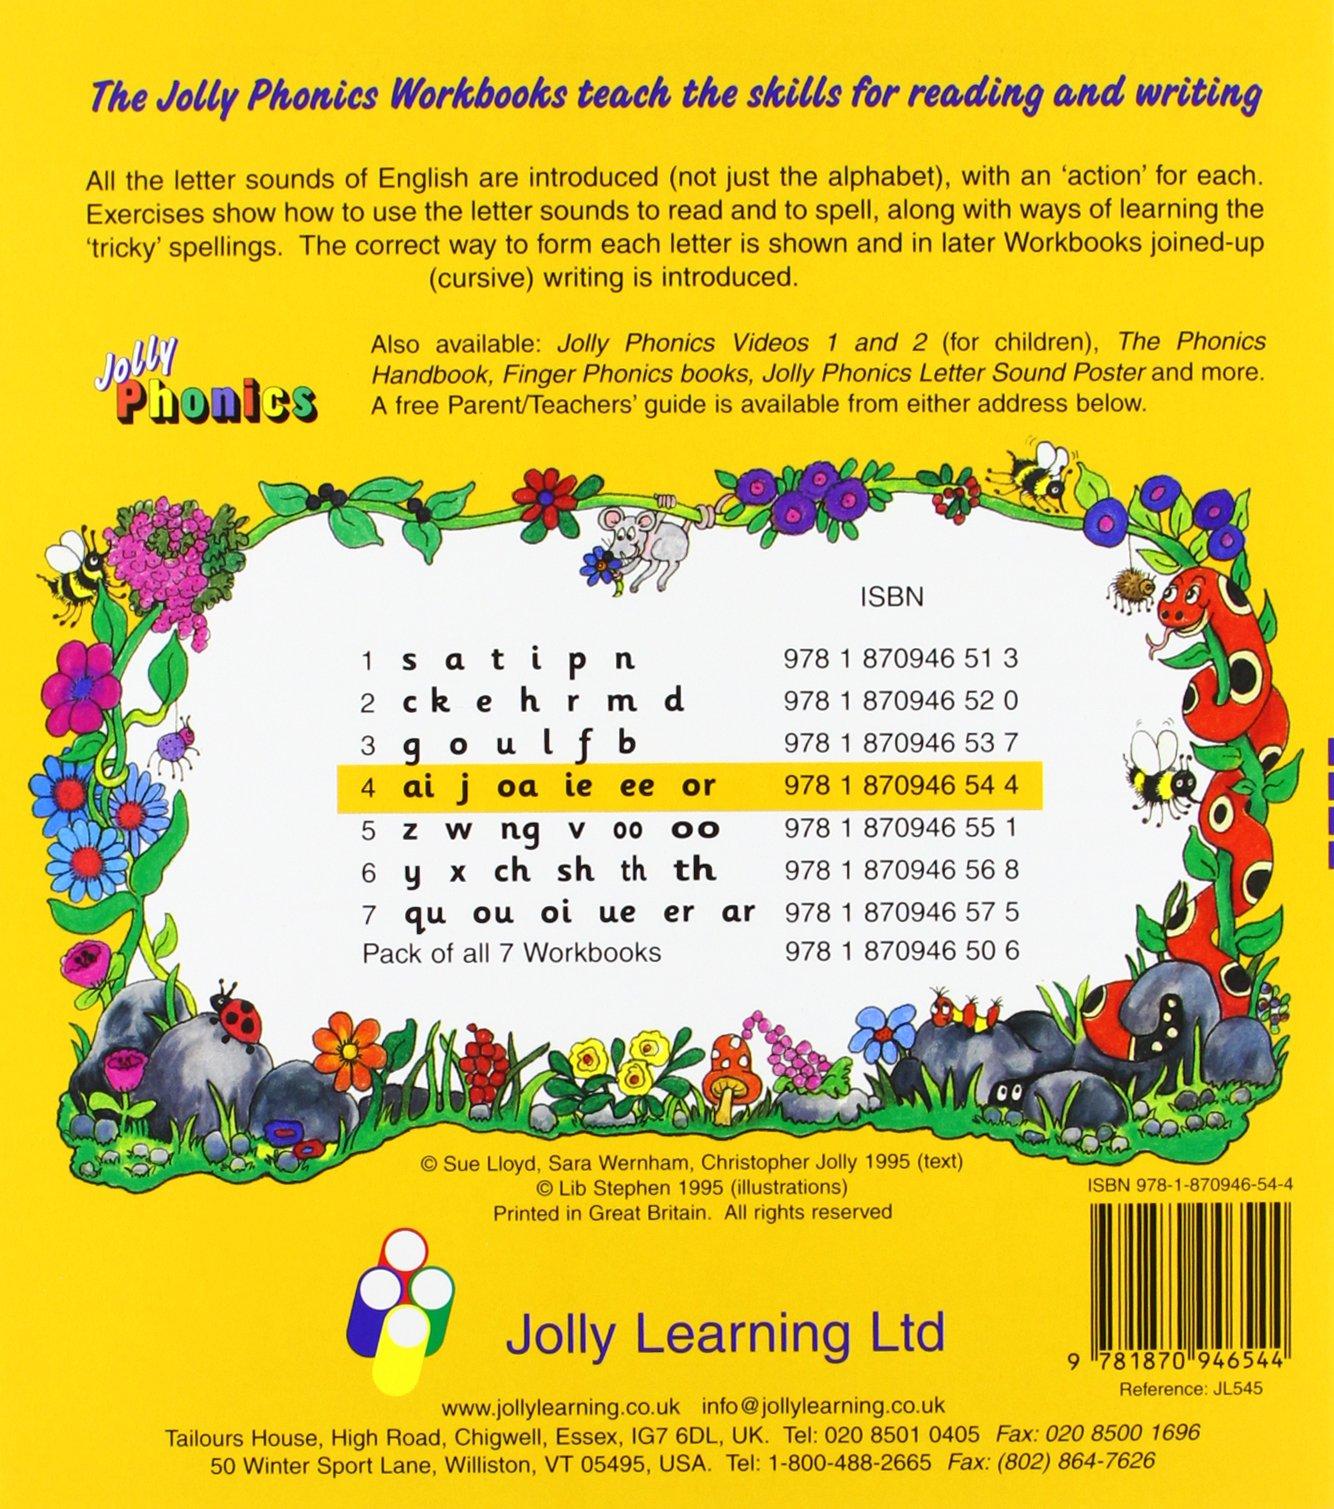 Jolly Phonics Workbooks 1 7 Lloyd Sue Wernham Sara 9781870946506 Amazon Com Books